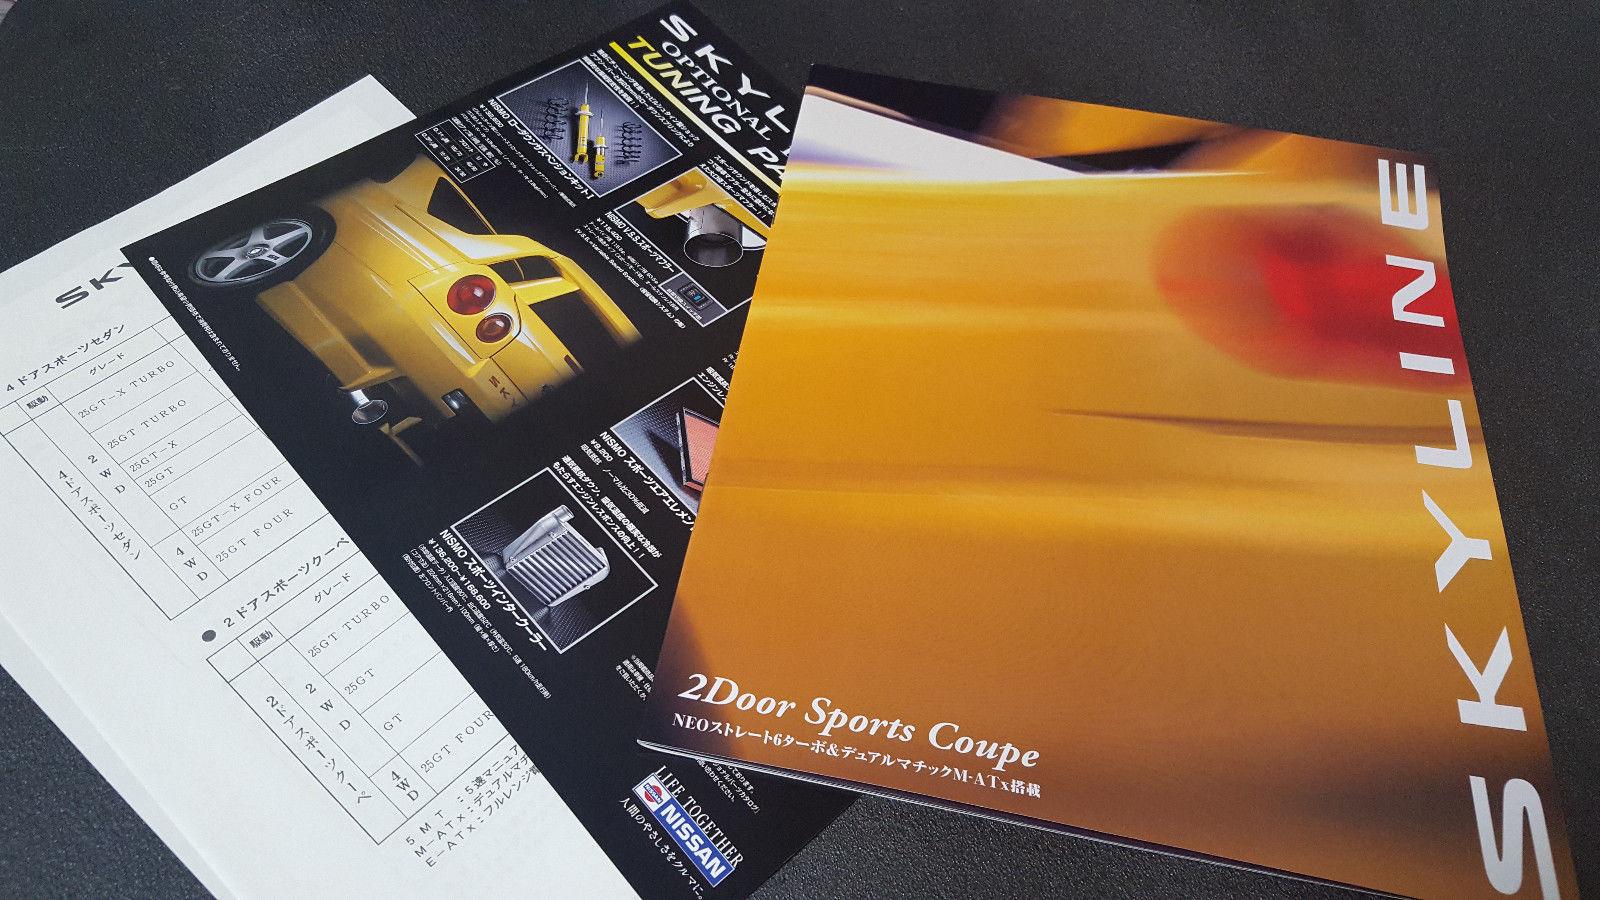 NISSAN SKYLINE Catalog 2DOOR Sports Coupe R34 1998s Japan Rare - $74.80